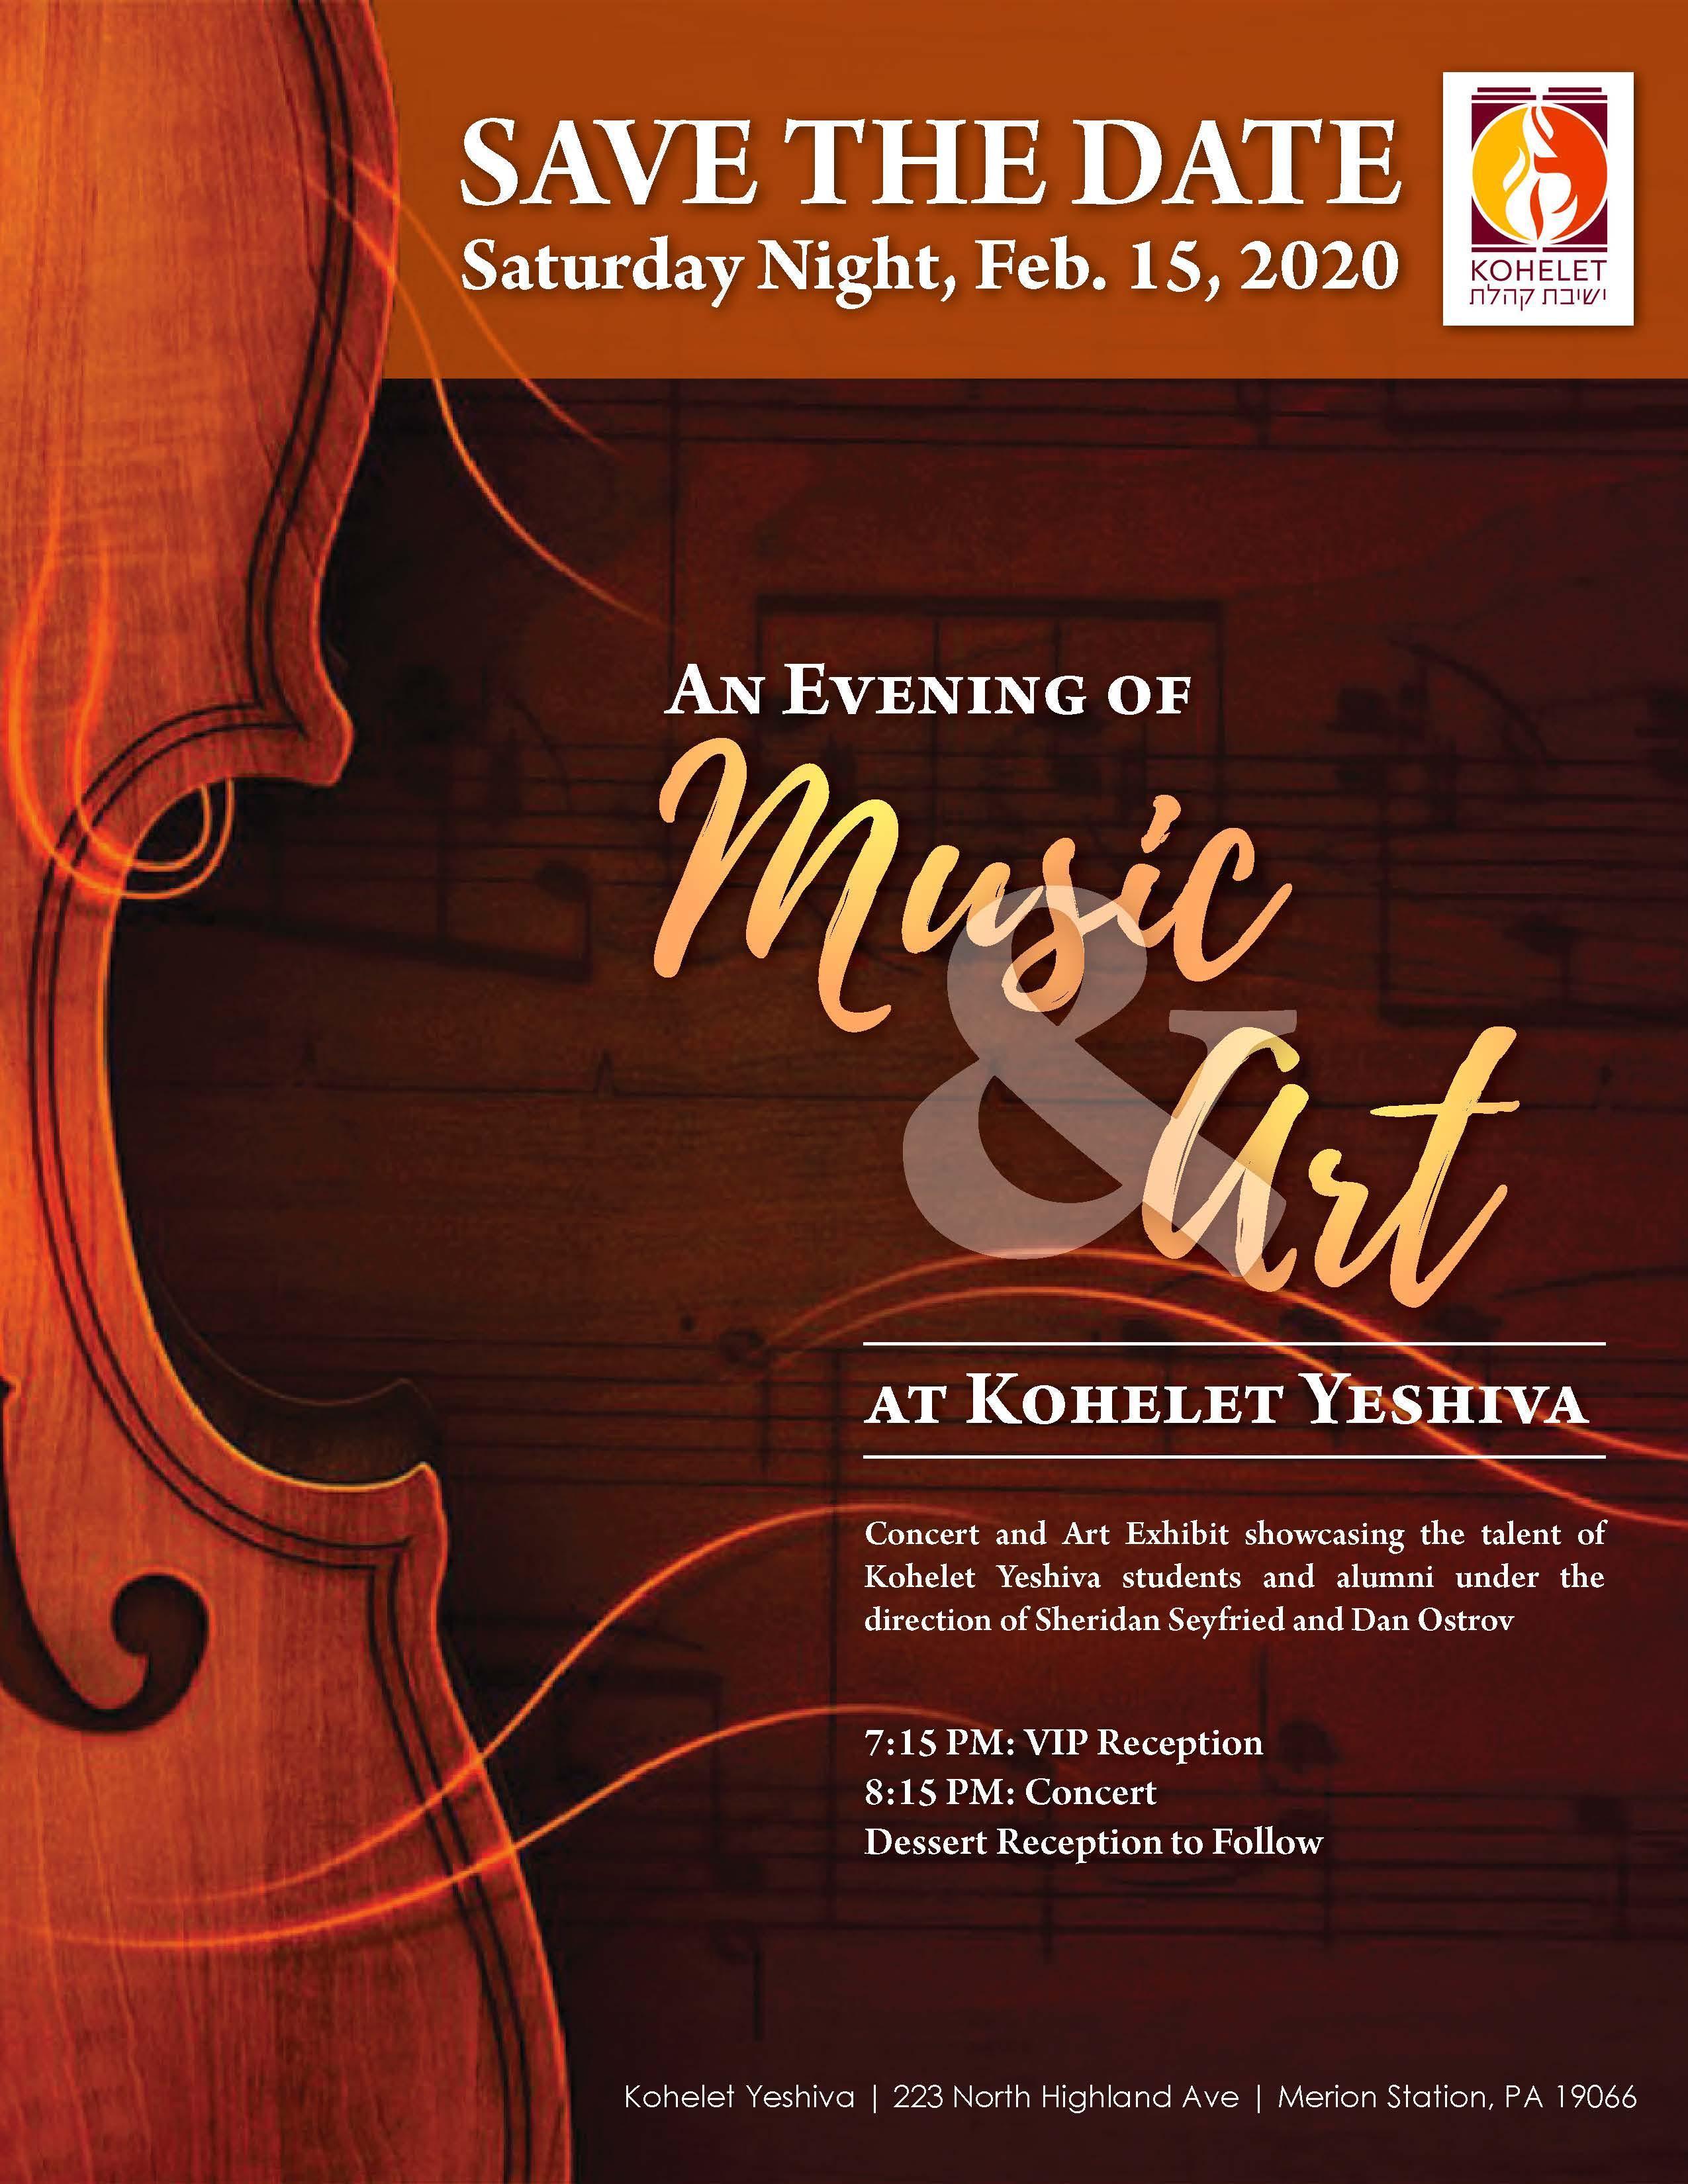 An Evening of Music and Art